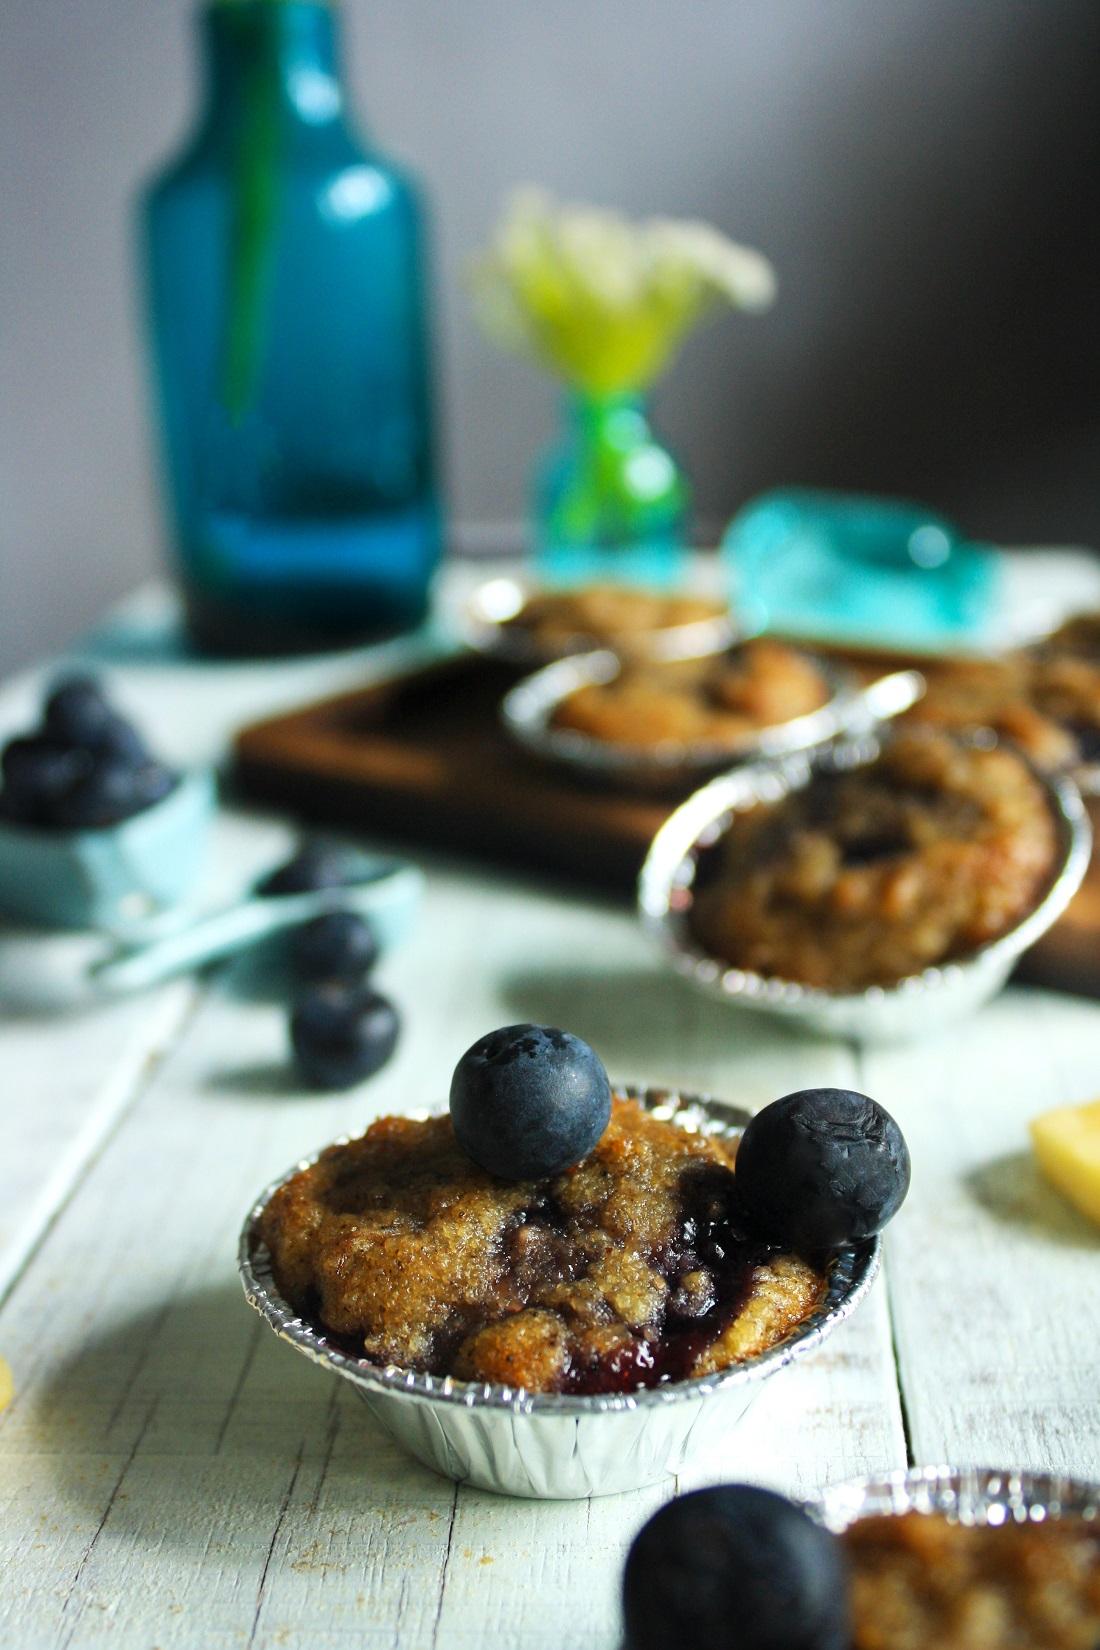 Banana & Blueberry Muffin Recipe. Paleo Flourless Baking